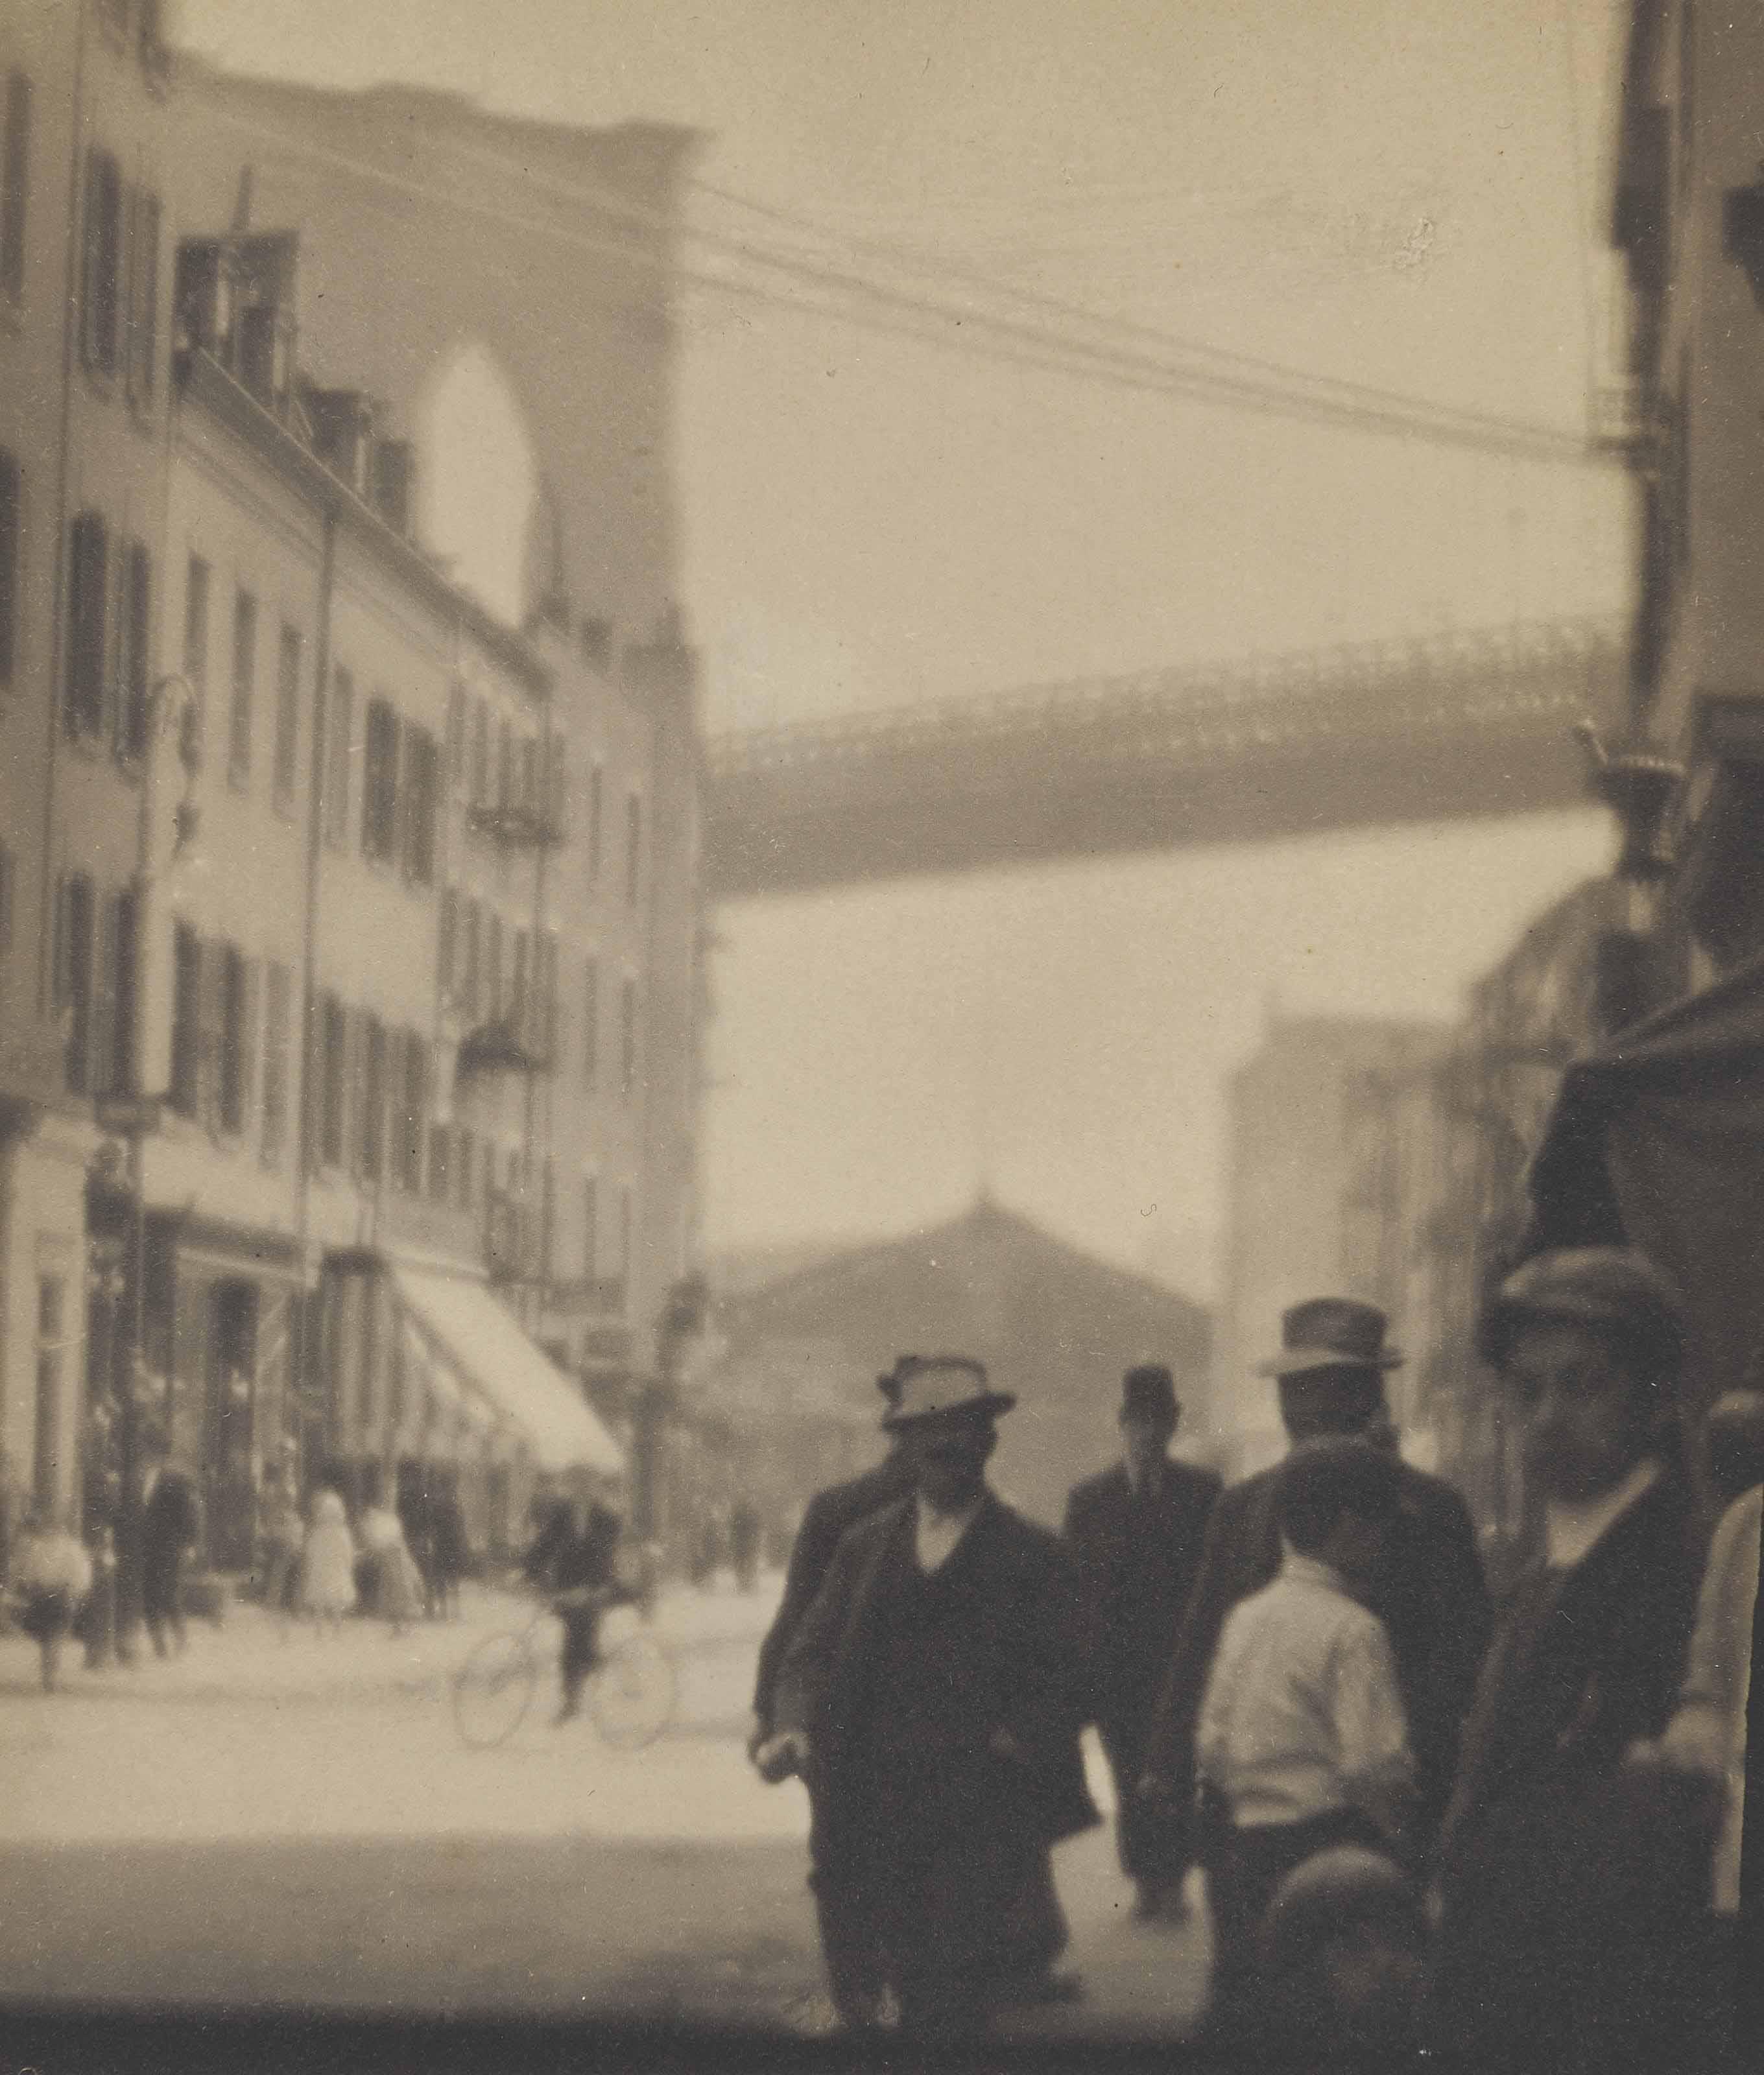 Lower East Side - To Brooklyn Bridge, 1912